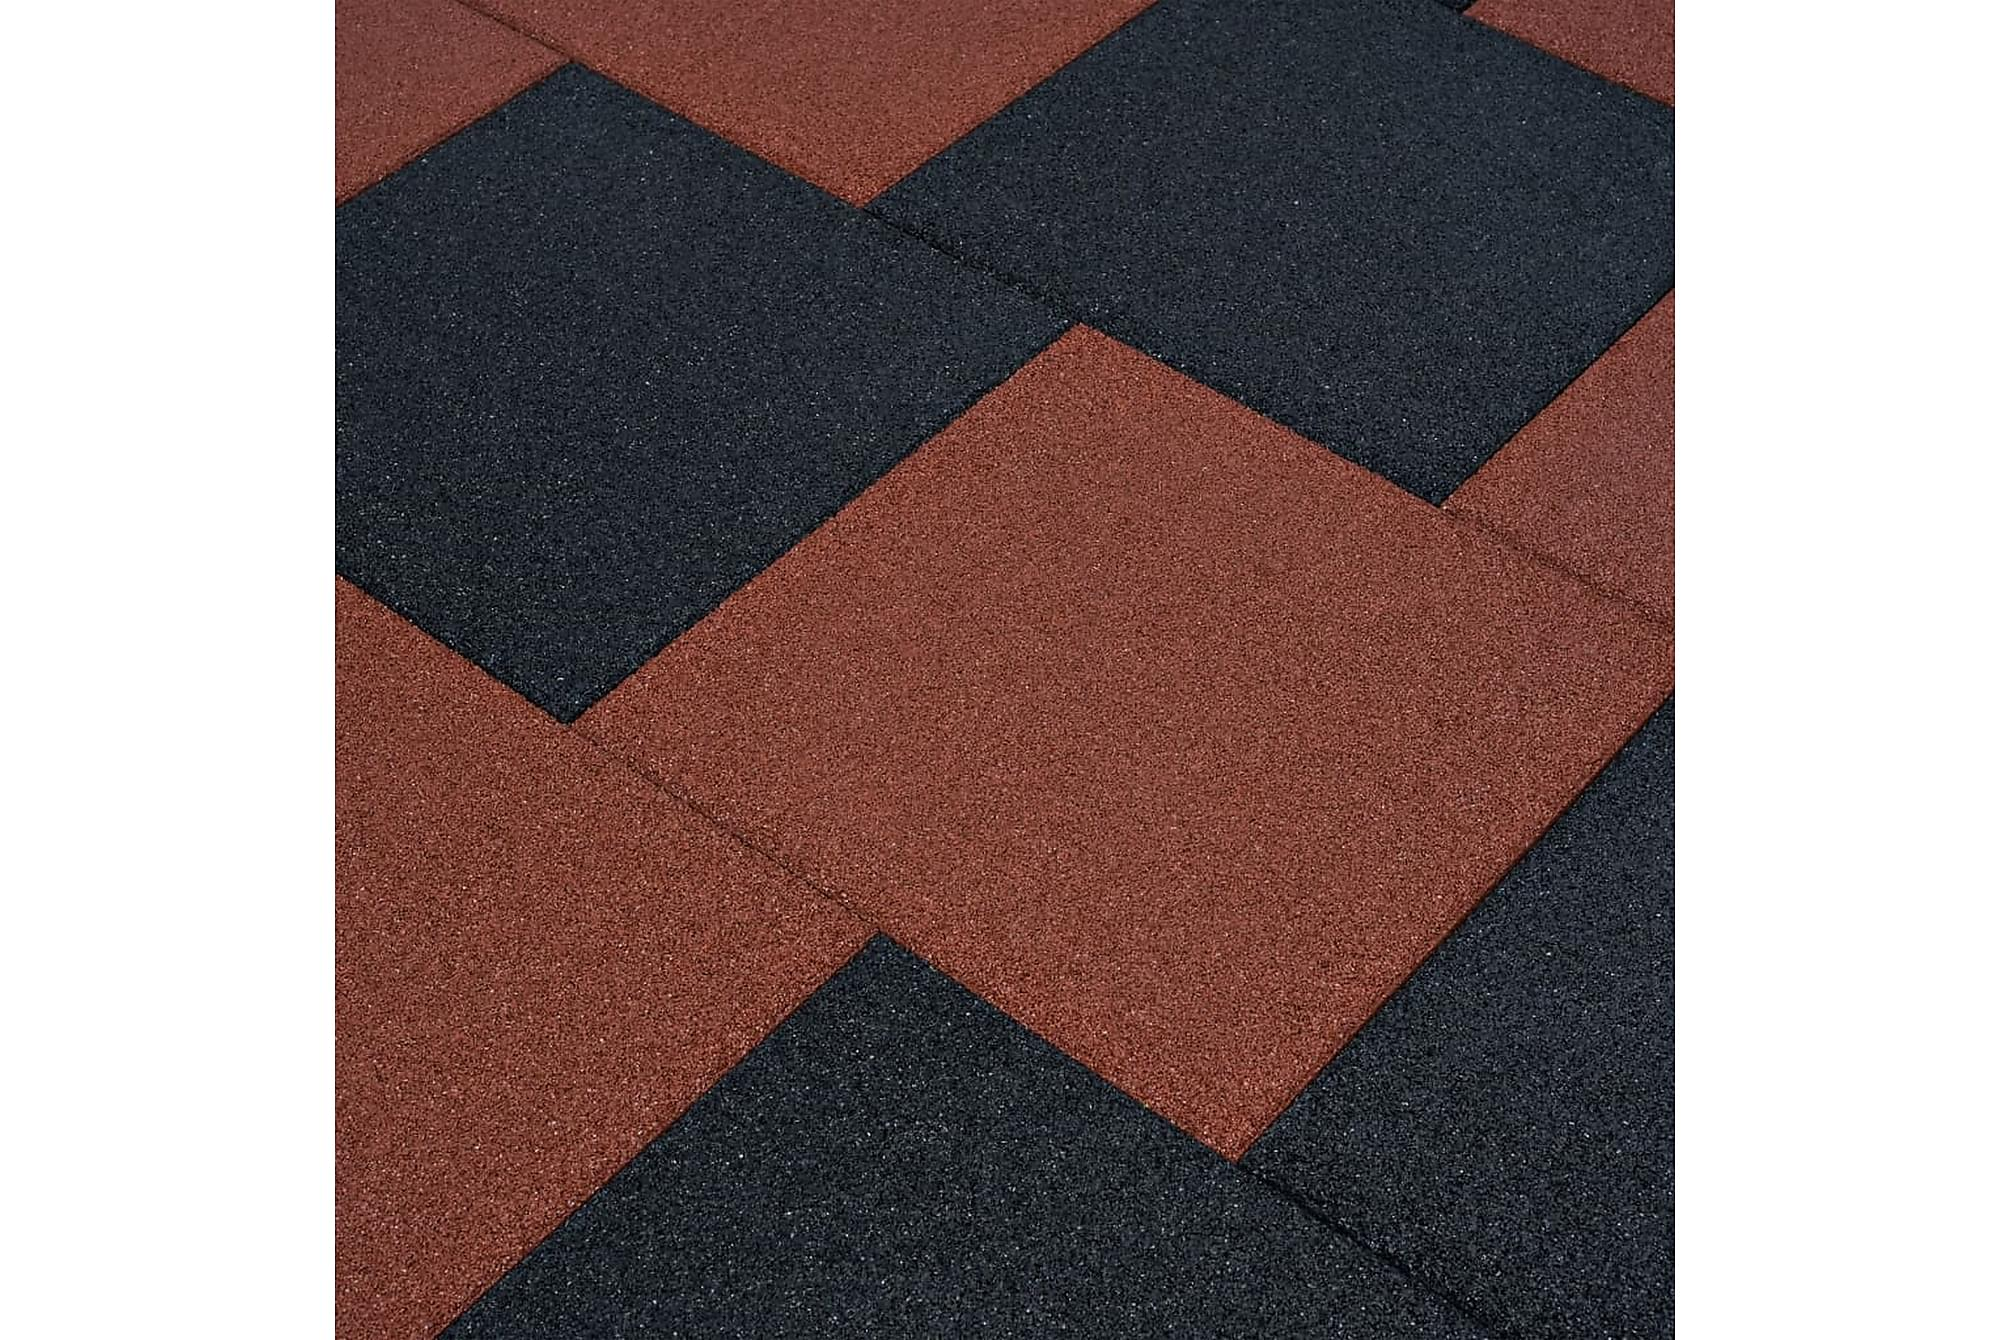 Fallskyddsmattor 18 st gummi 50x50x3 cm svart, Golvskydd